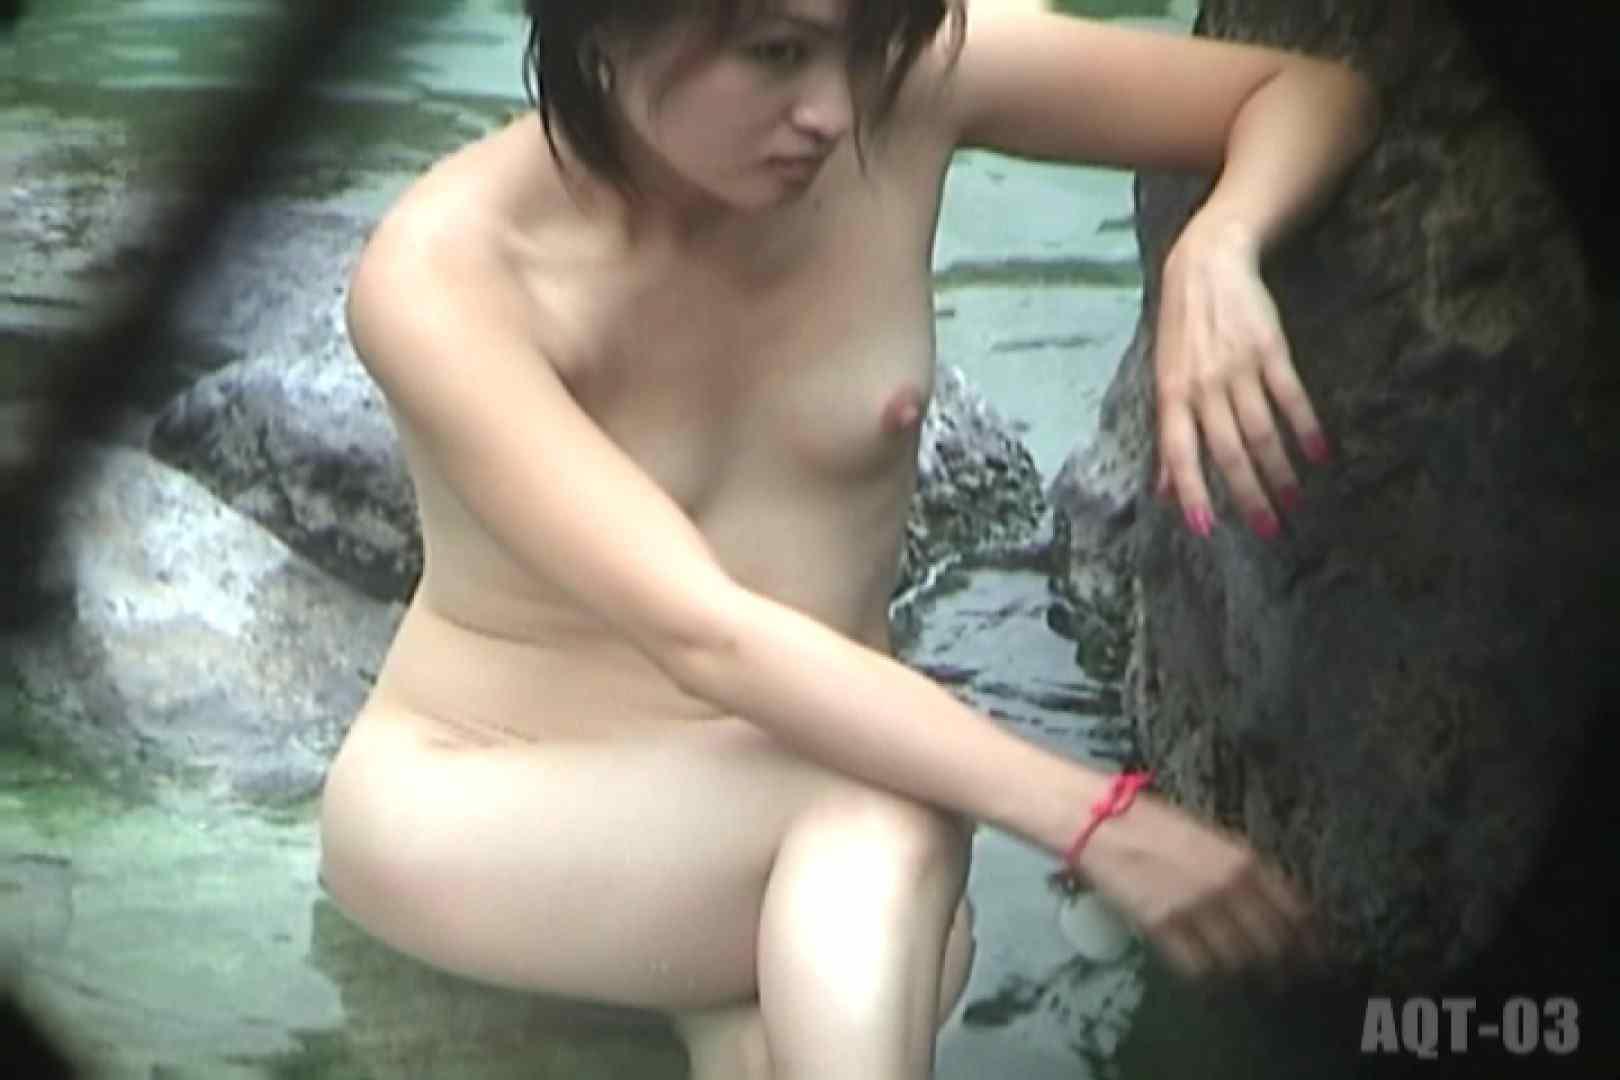 Aquaな露天風呂Vol.727 盗撮   OLエロ画像  110PICs 52